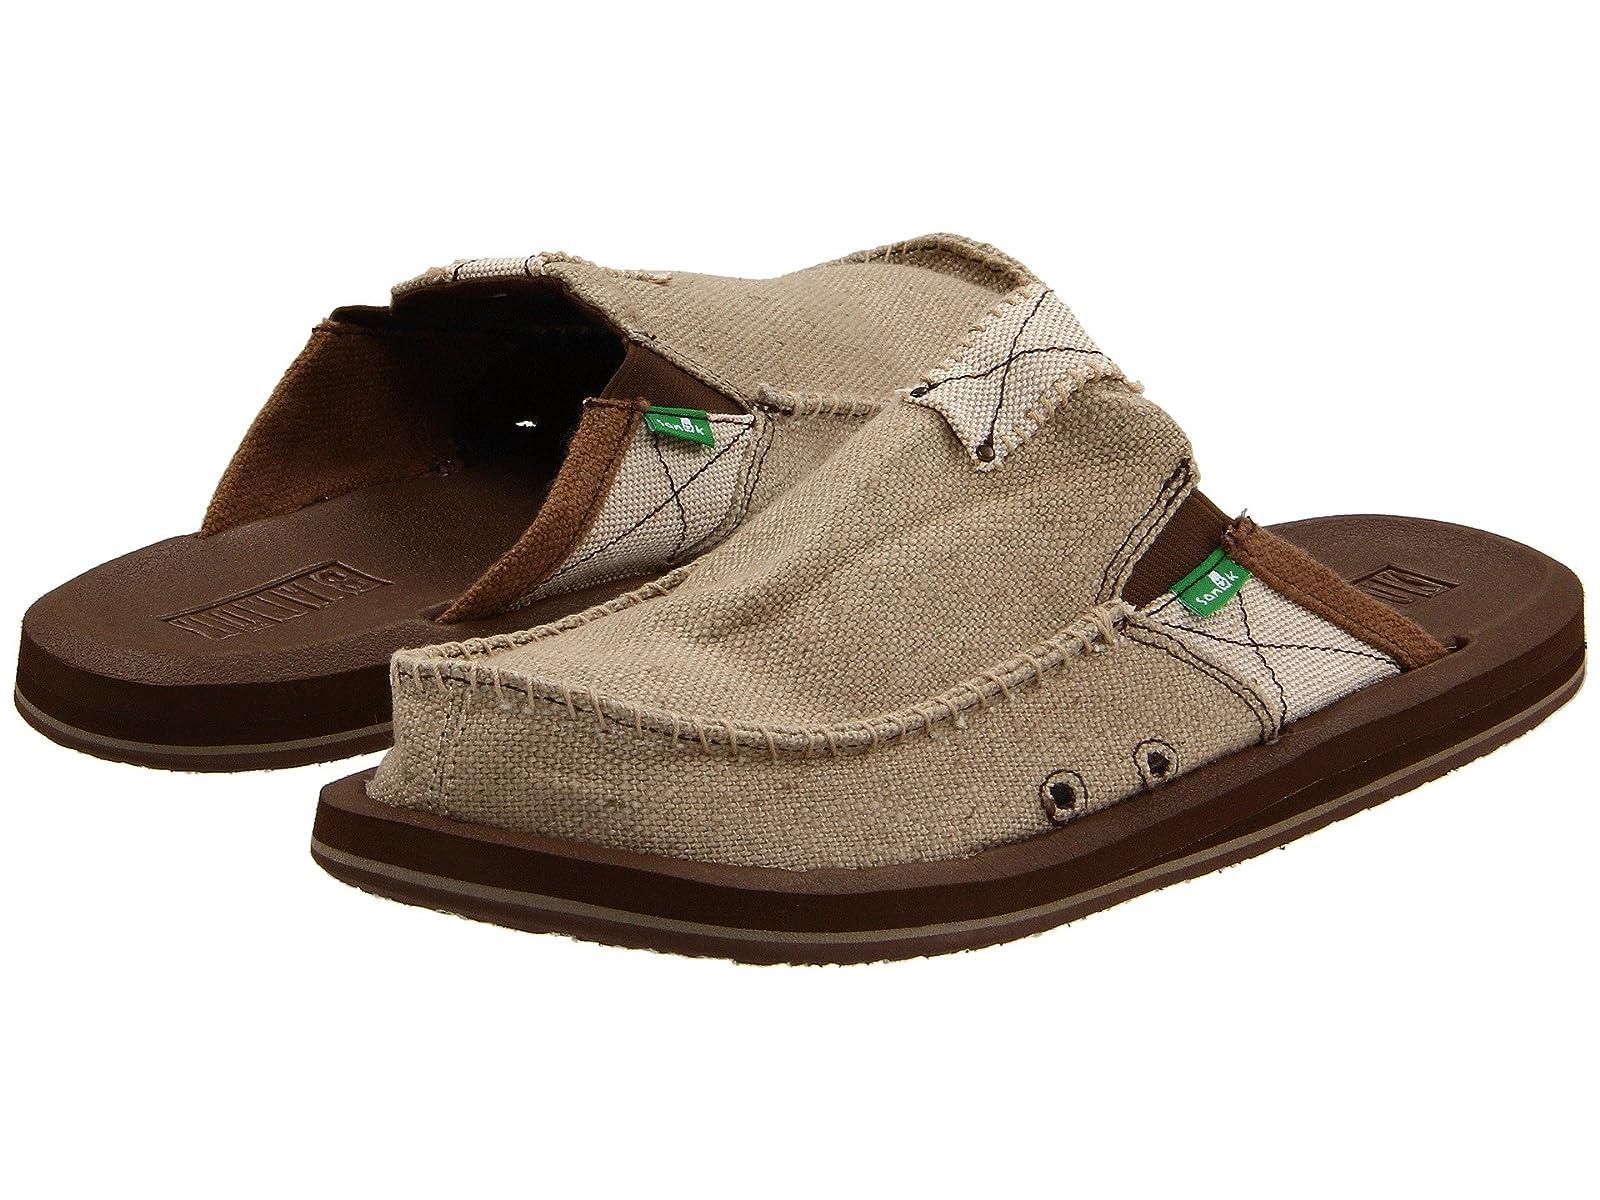 Sanuk You Got My Back IIAtmospheric grades have affordable shoes